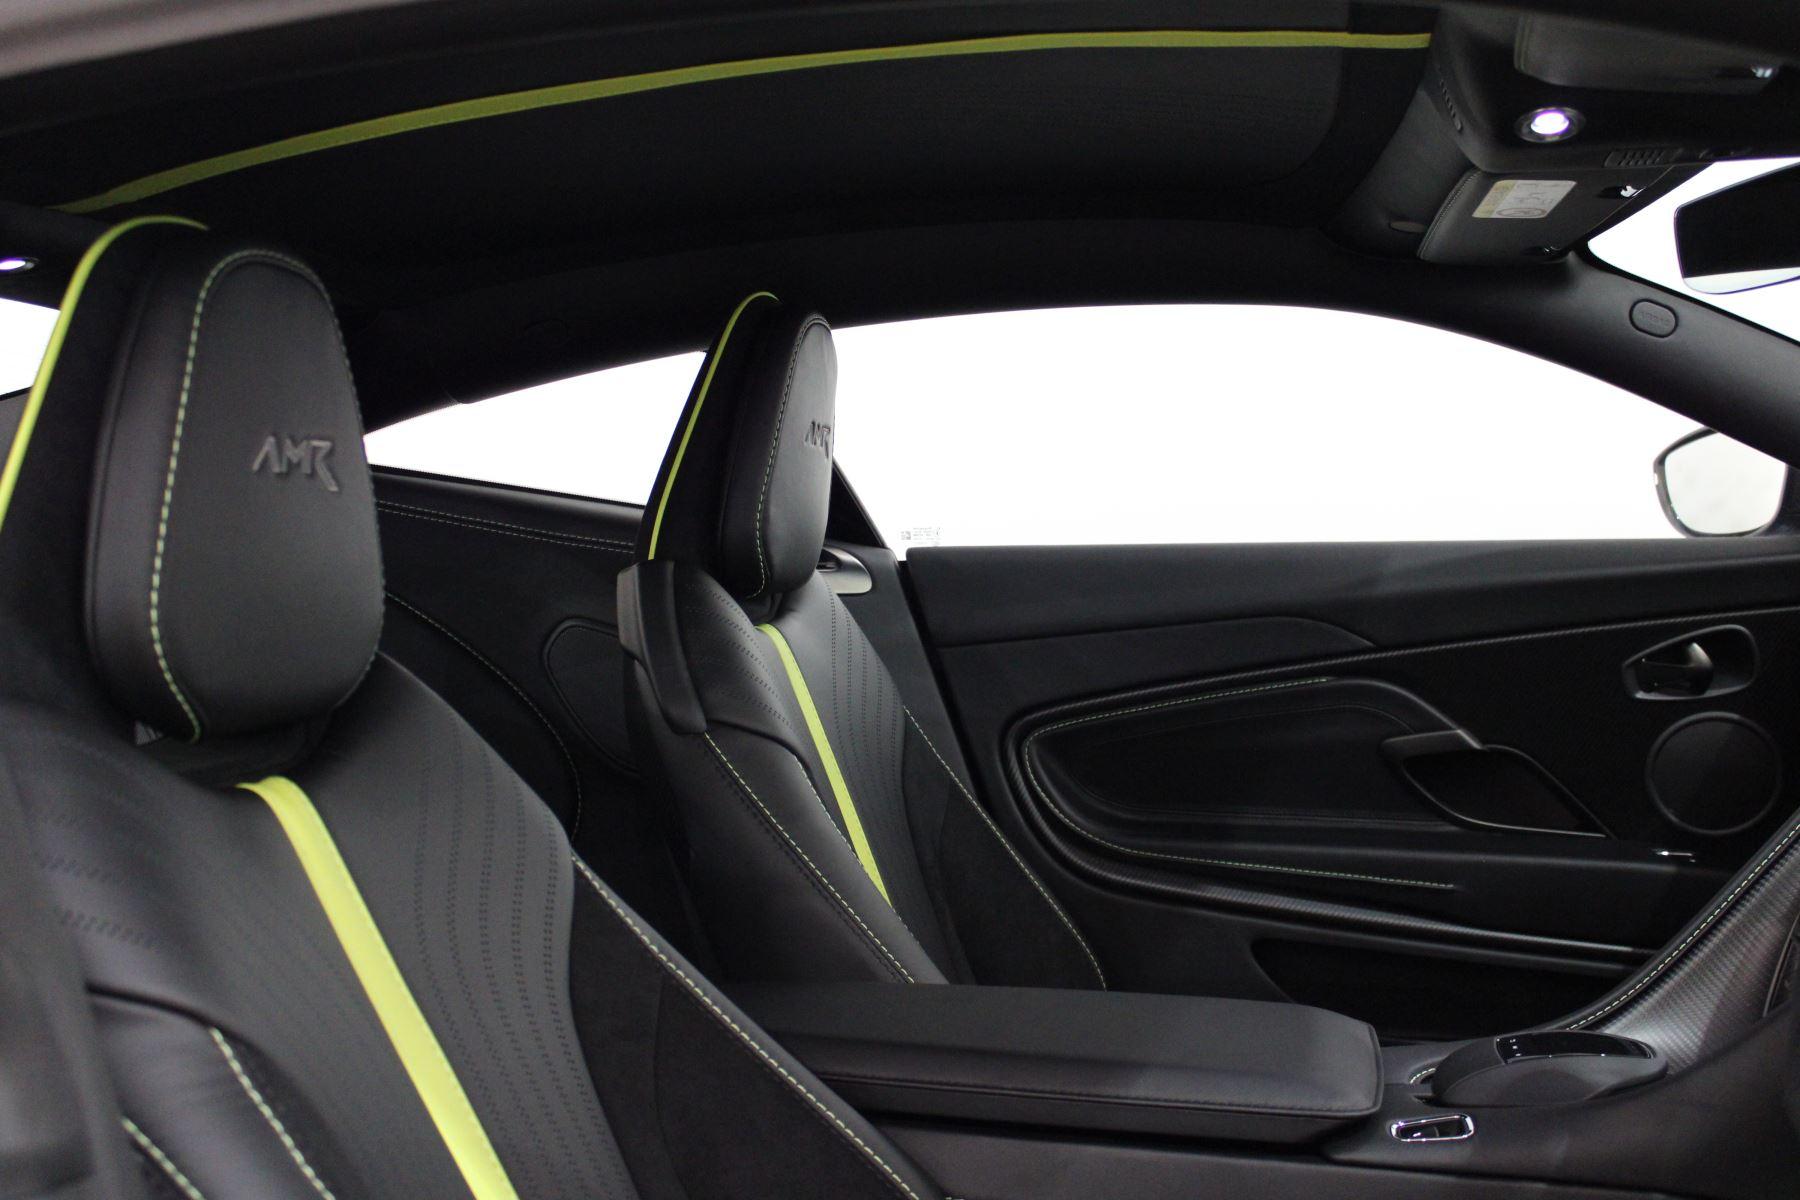 Aston Martin DB11 AMR Touchtronic image 26